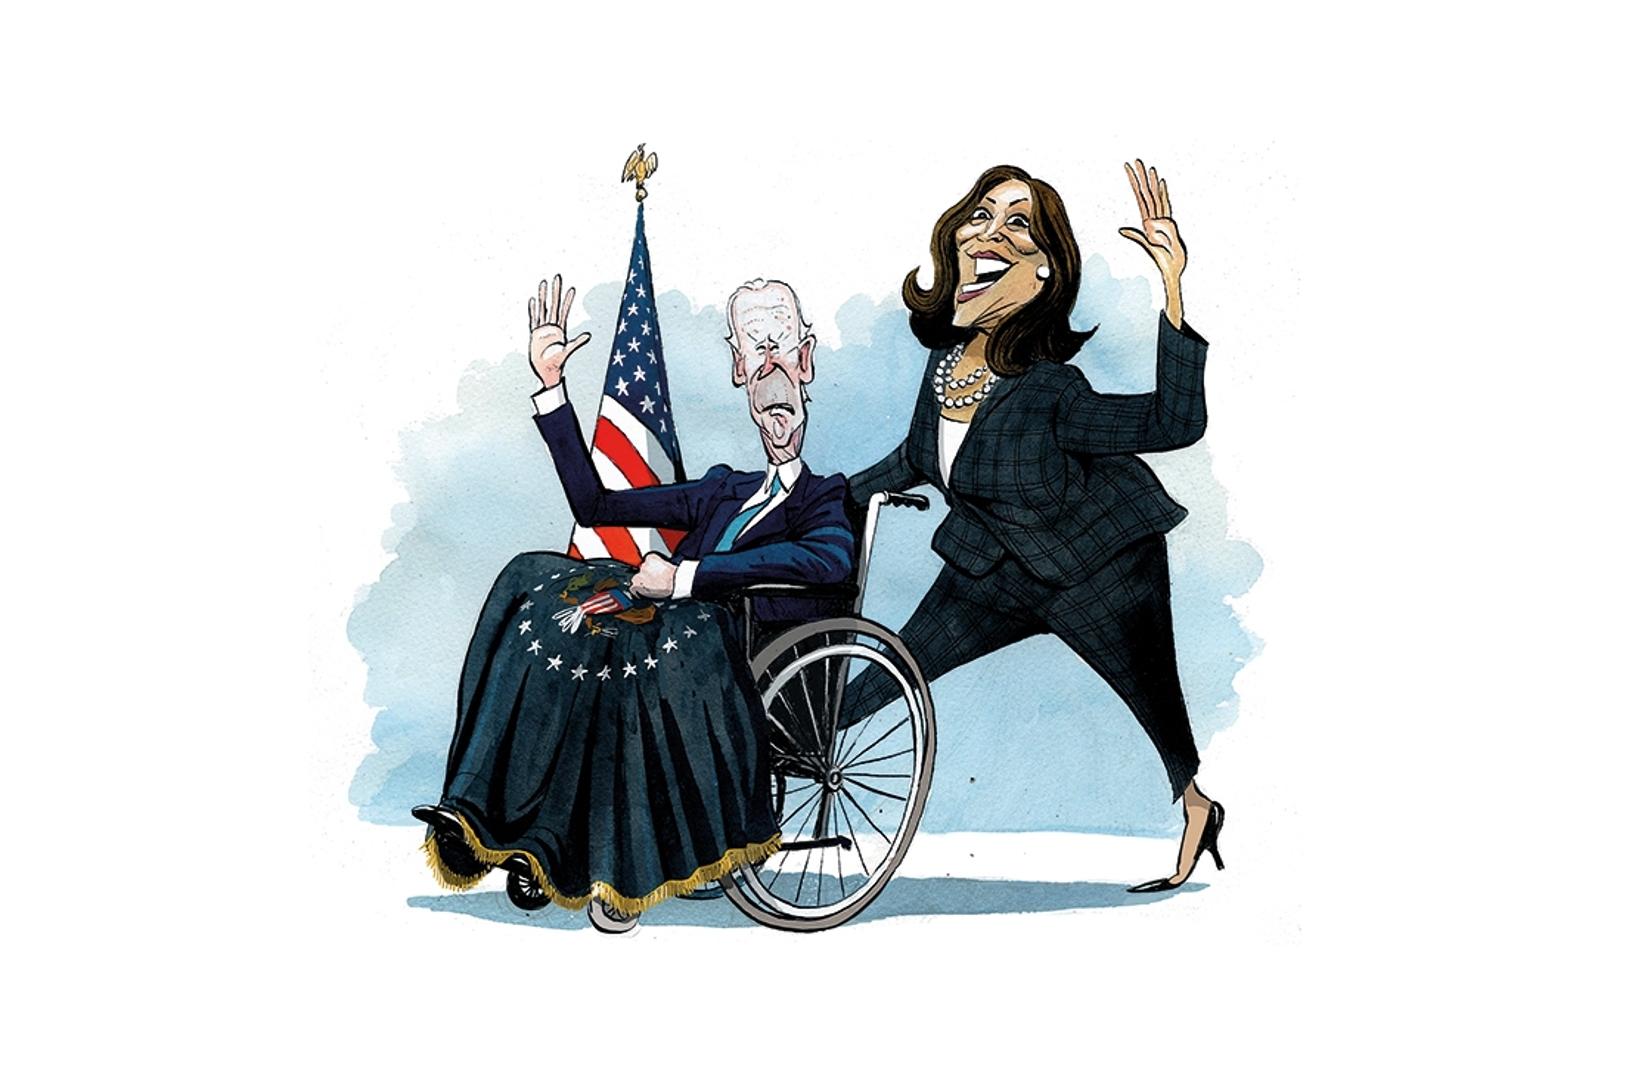 If Biden Wins Who Will Govern By F Gray Vietbf Vietbf.com is 1 decade 2 years 7 months old. biden wins who will govern by f gray